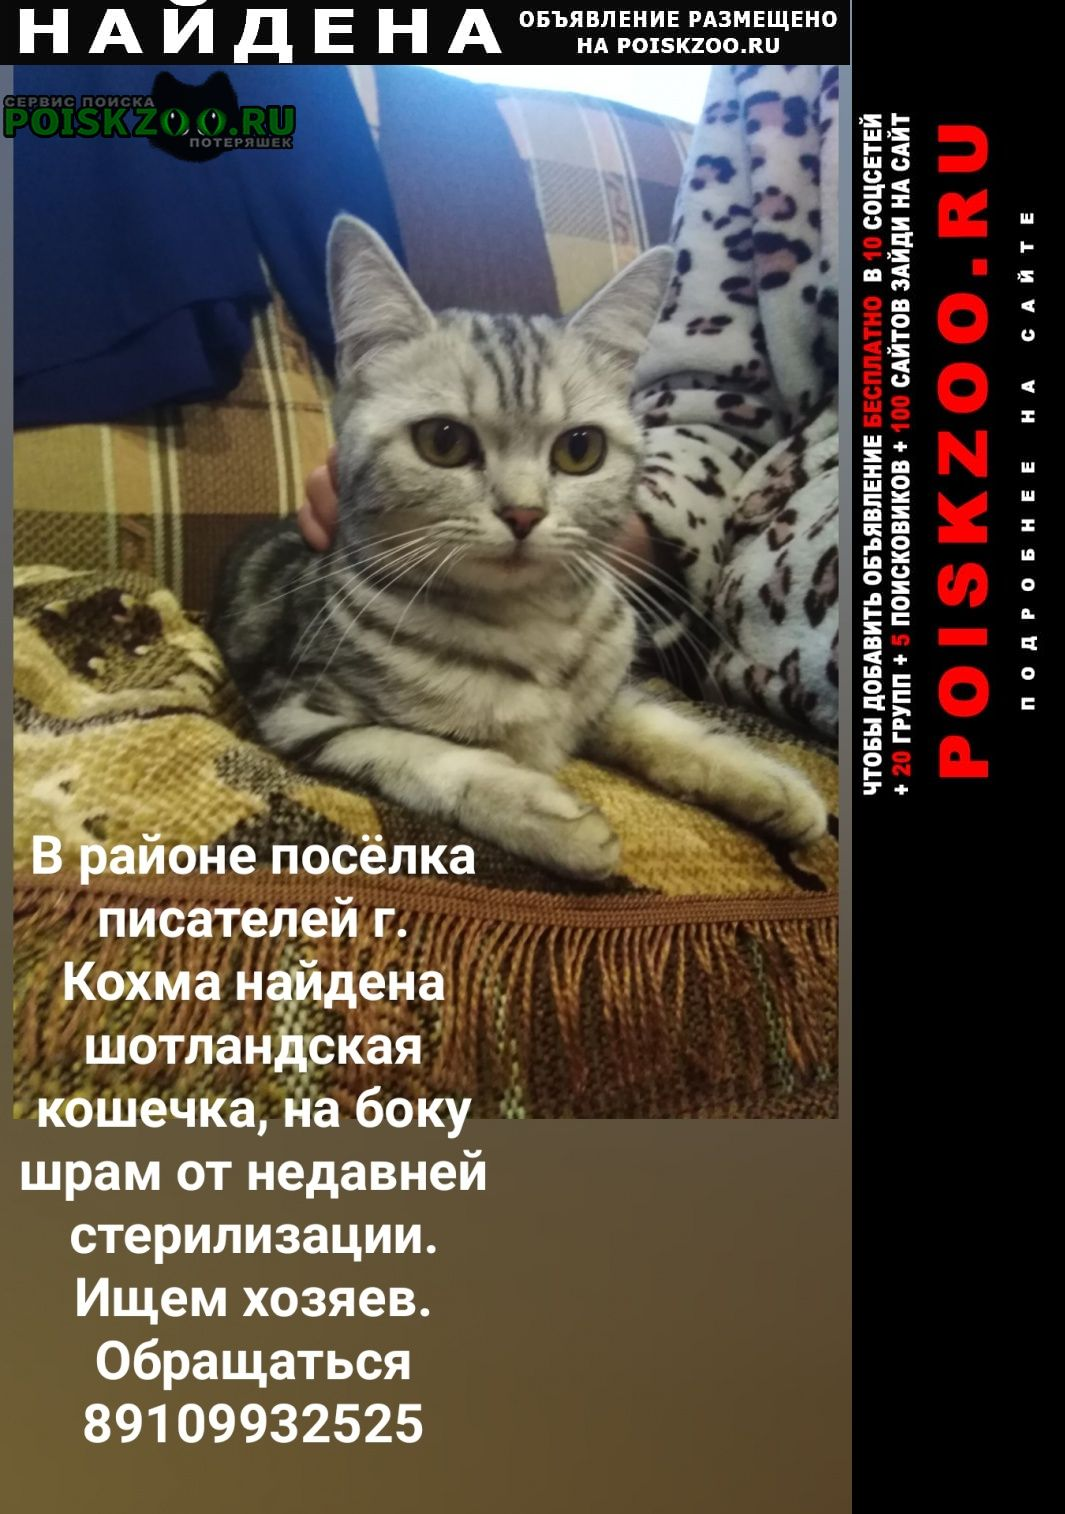 Найдена кошка Кохма